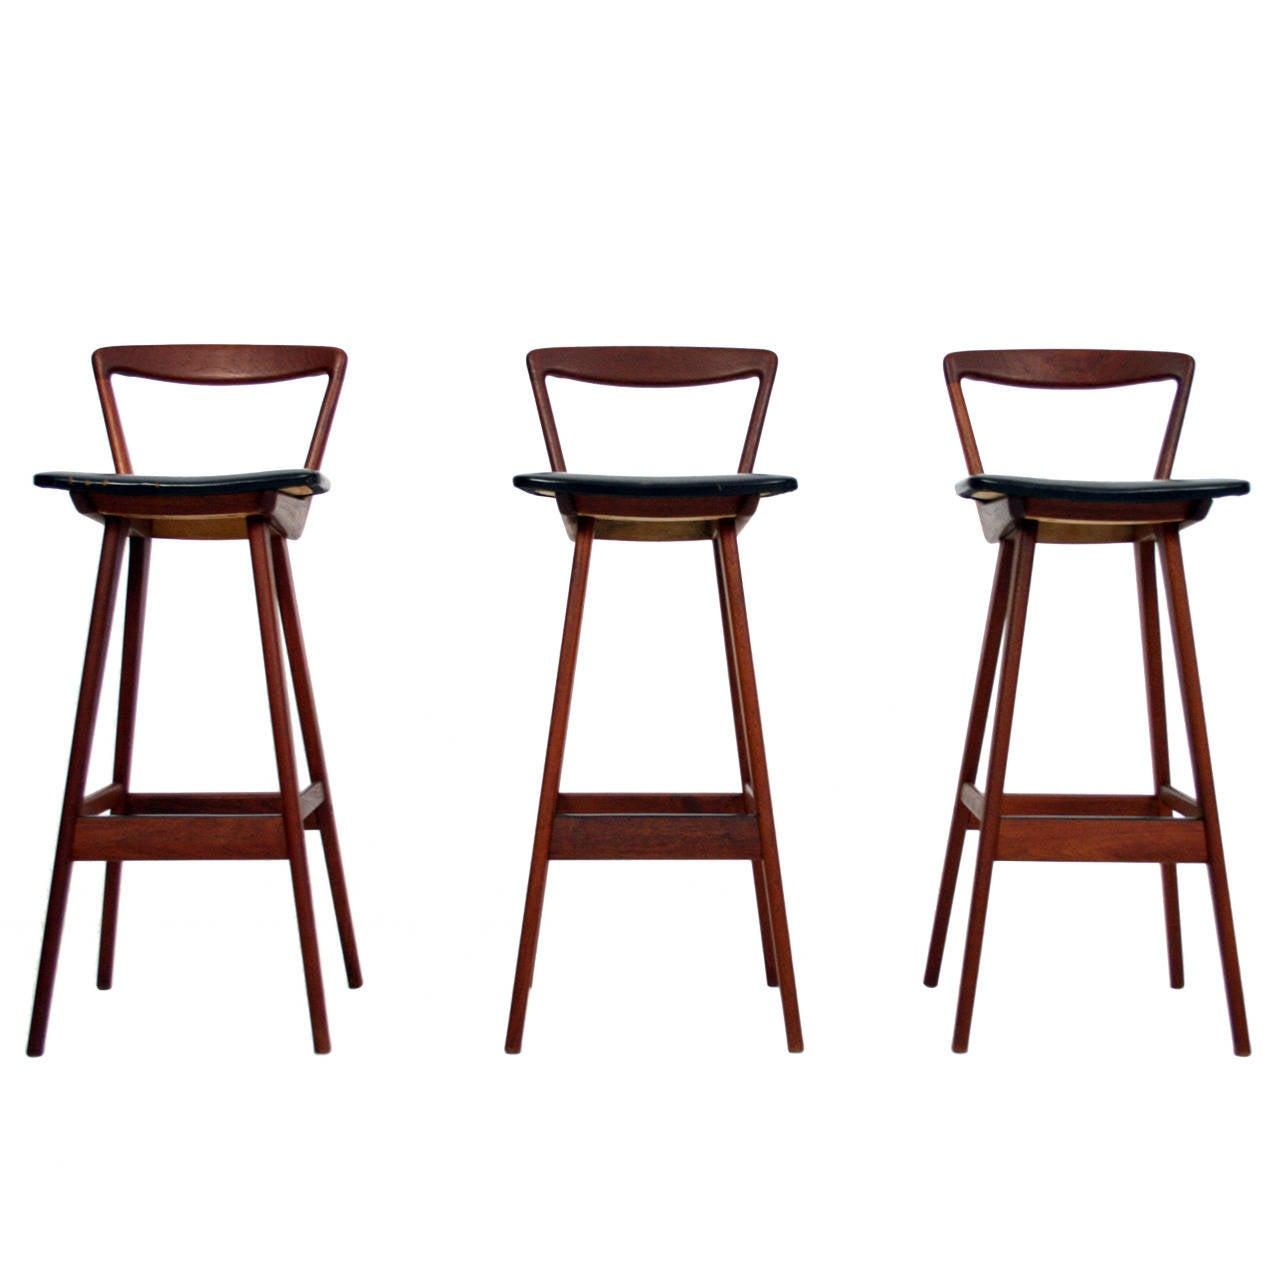 Rare Set Of Three Teak Bar Stools By Rosengren Hansen For